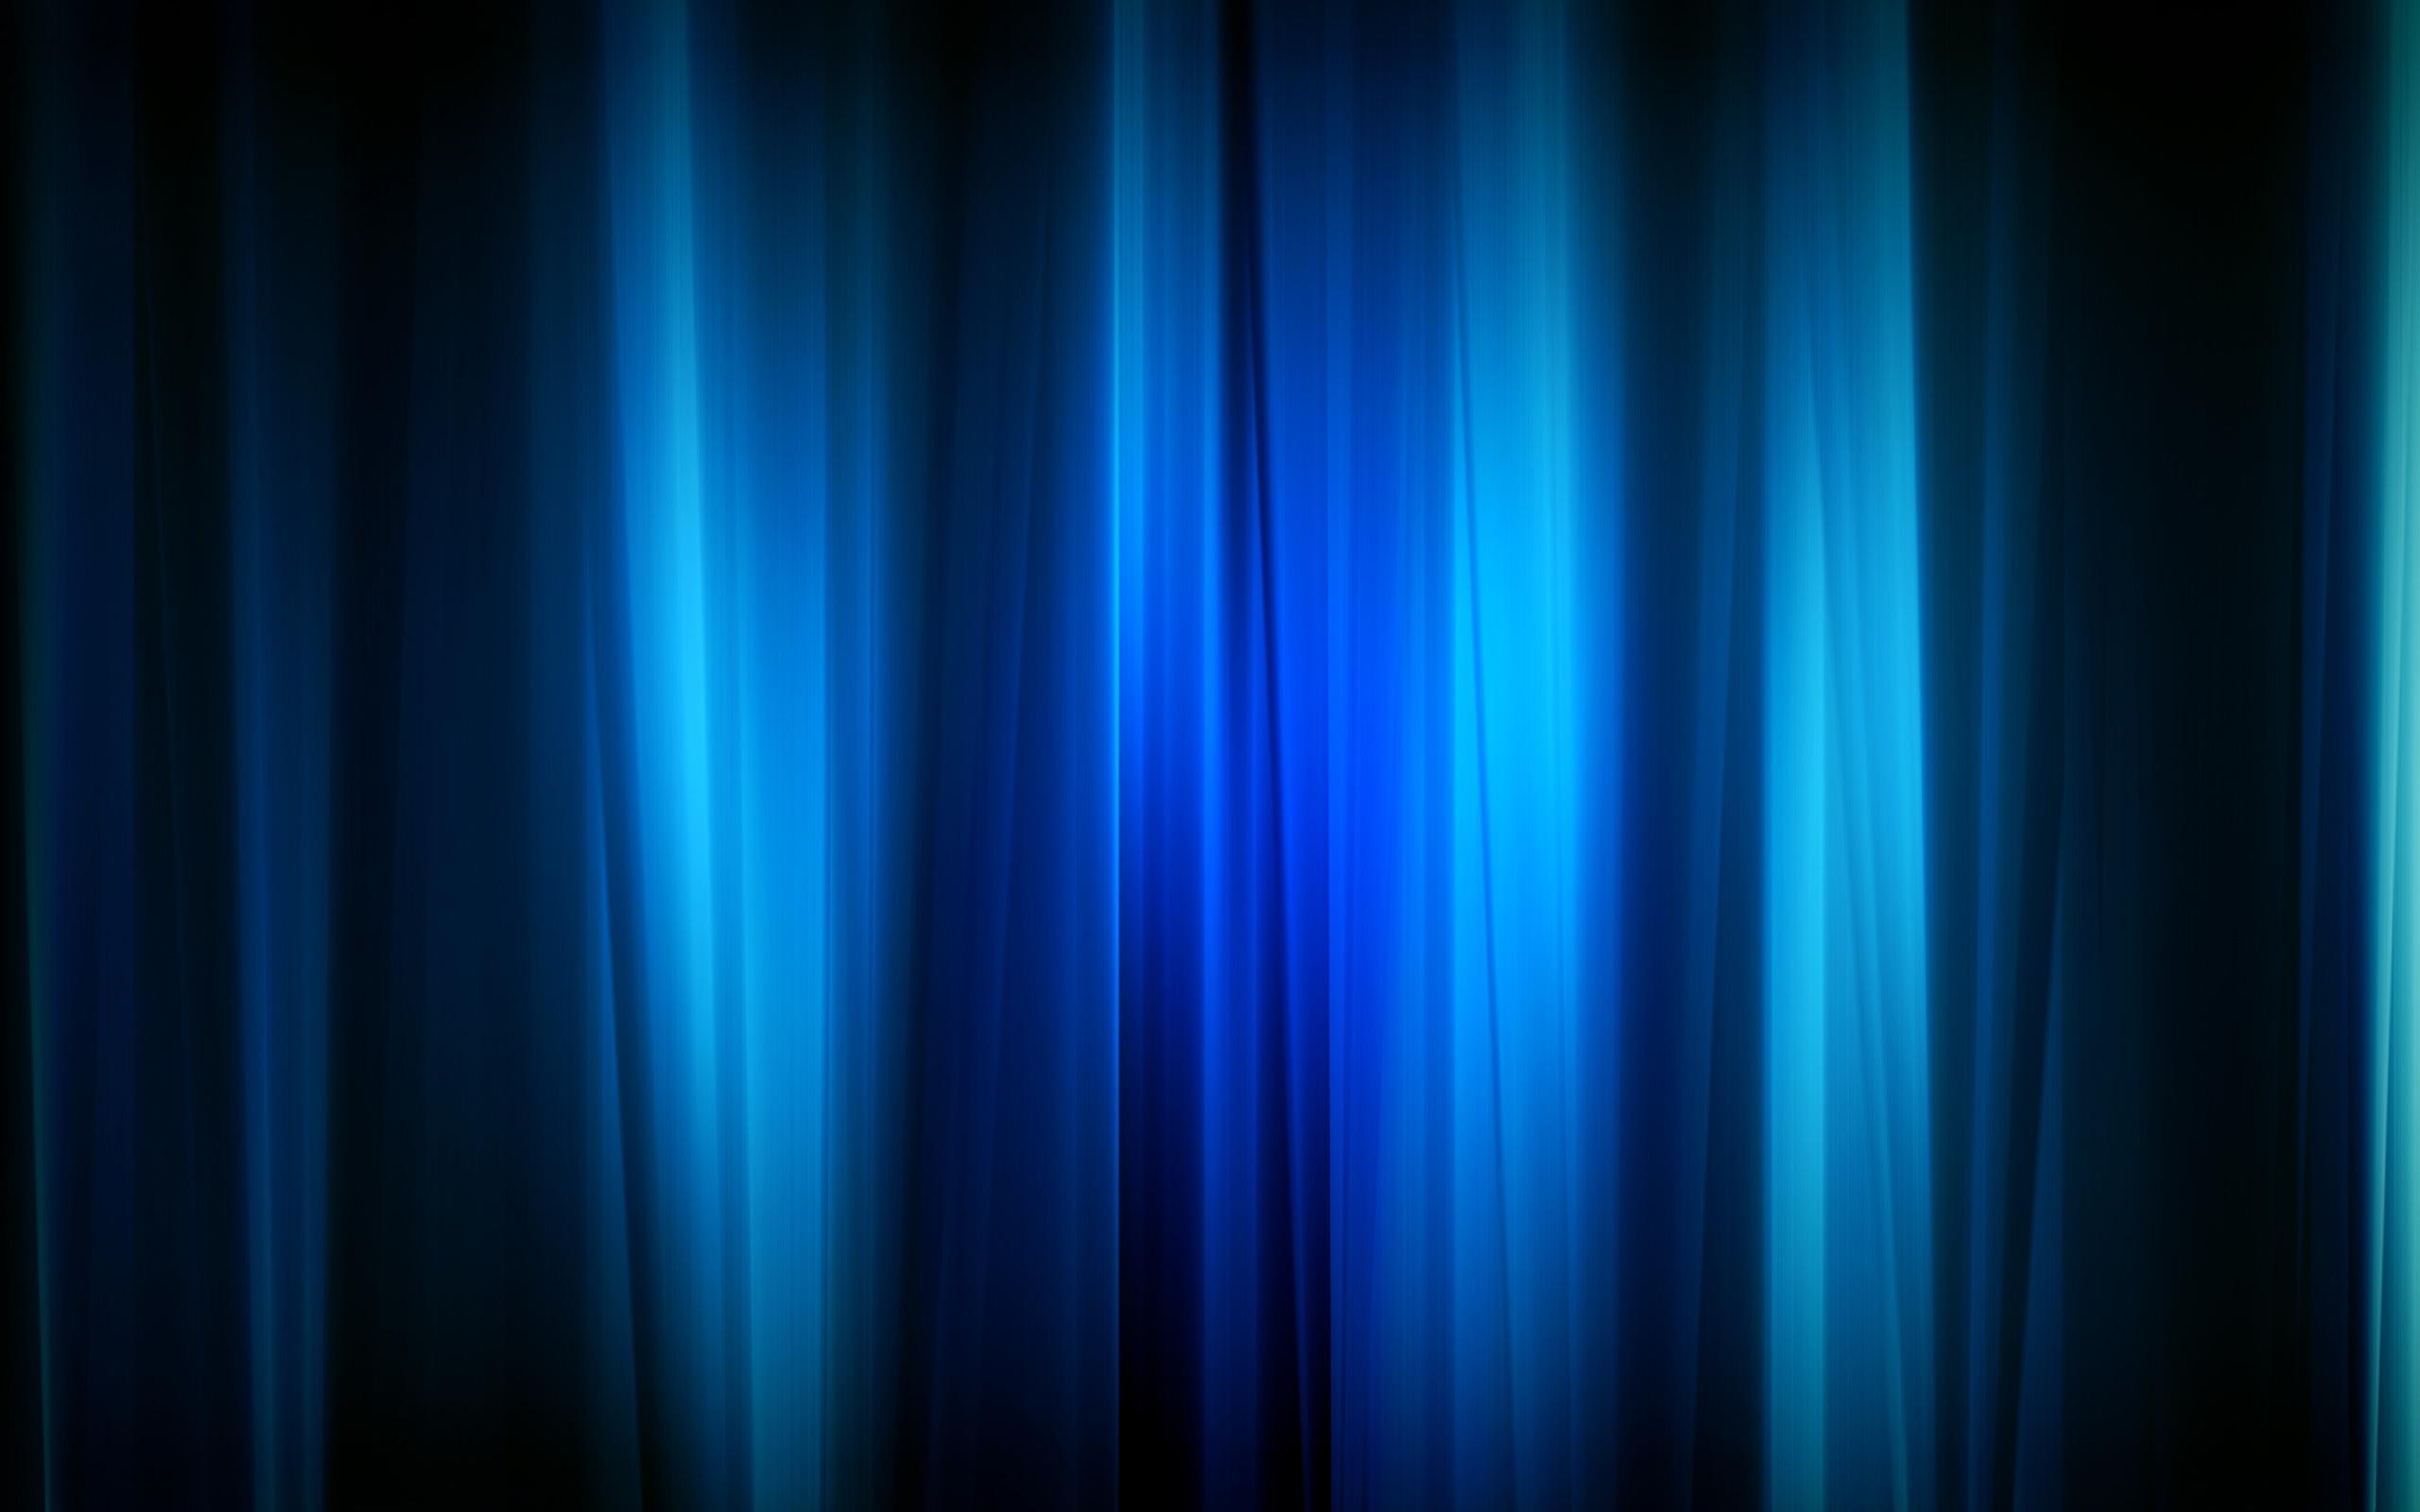 Stage curtain wallpaper wallpapersafari - Blue Curtain Wallpapers Hd Wallpapers